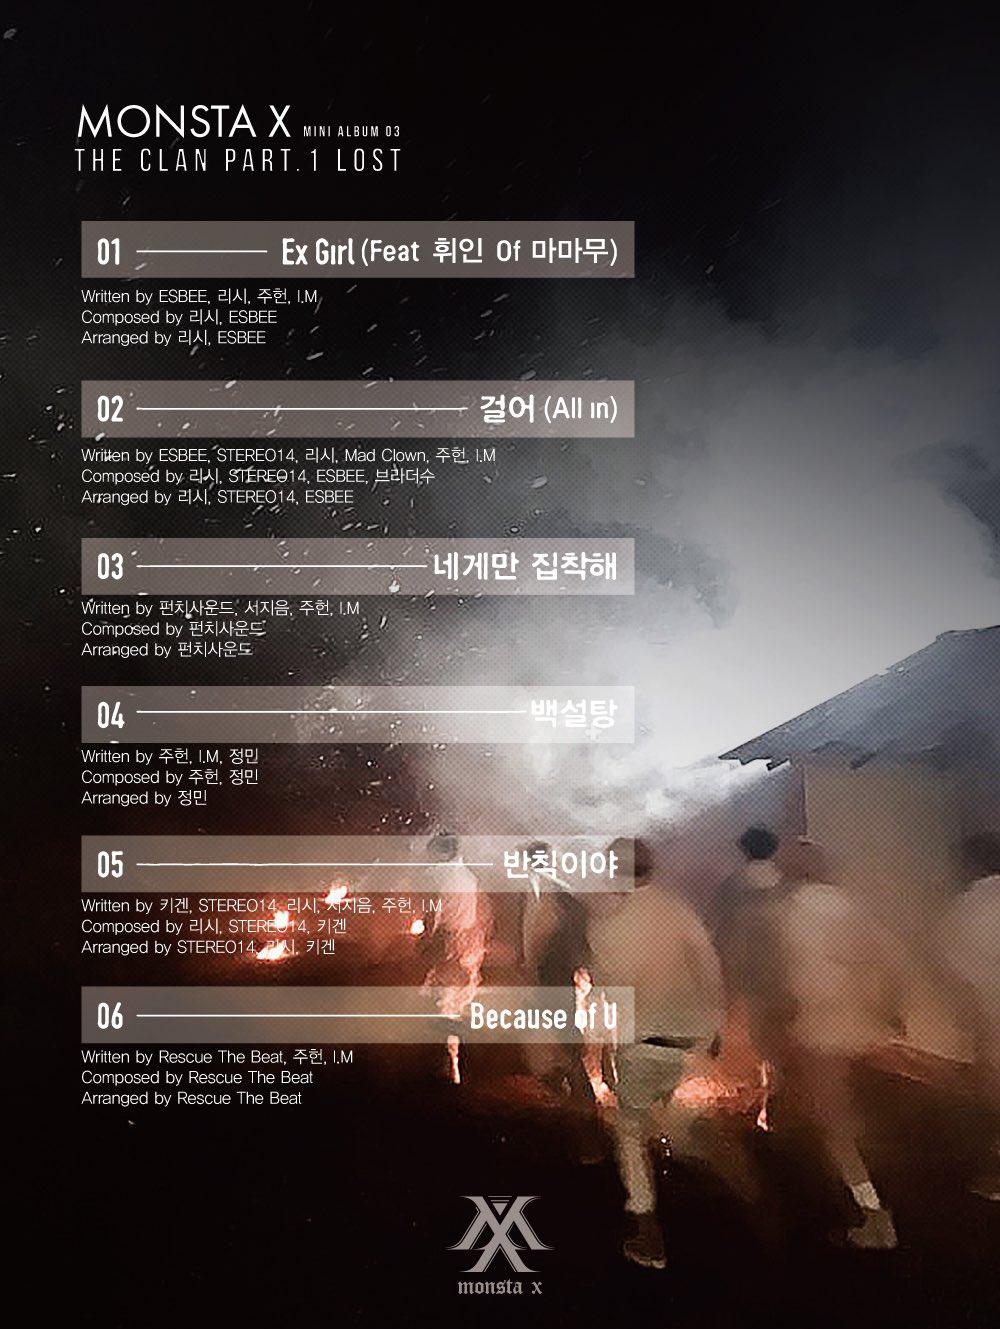 monsta x track list